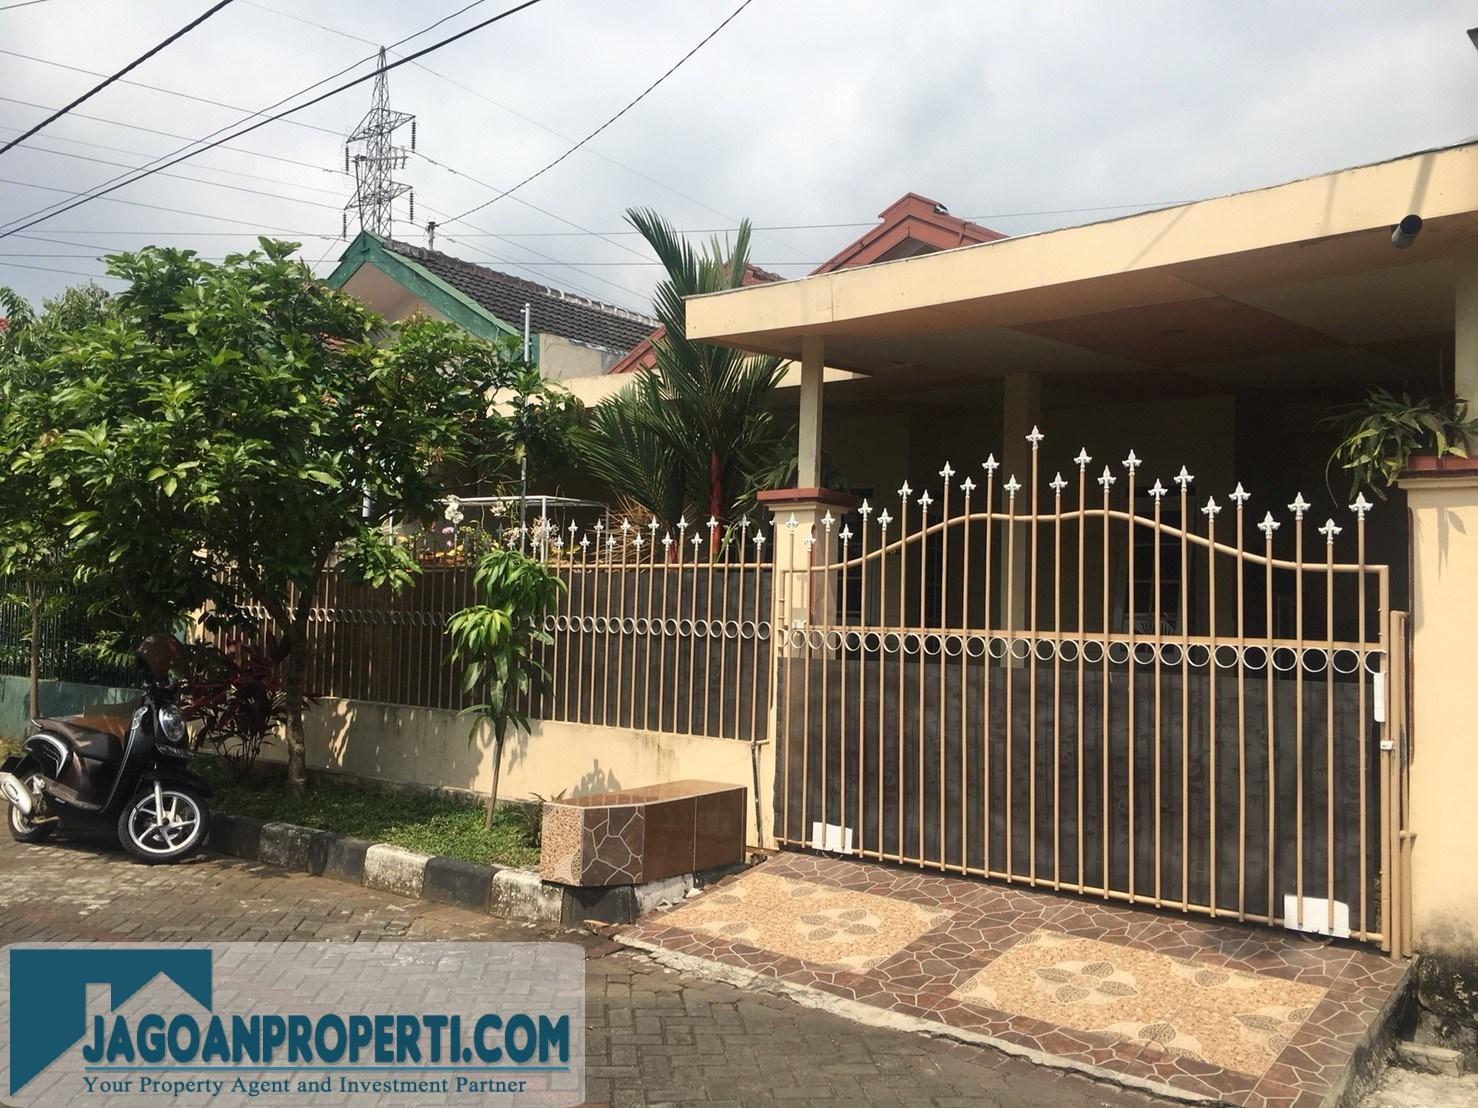 Rumah Dijual Di Perumahan Tlogomas Malang Kota Jual Rumah Di Malang